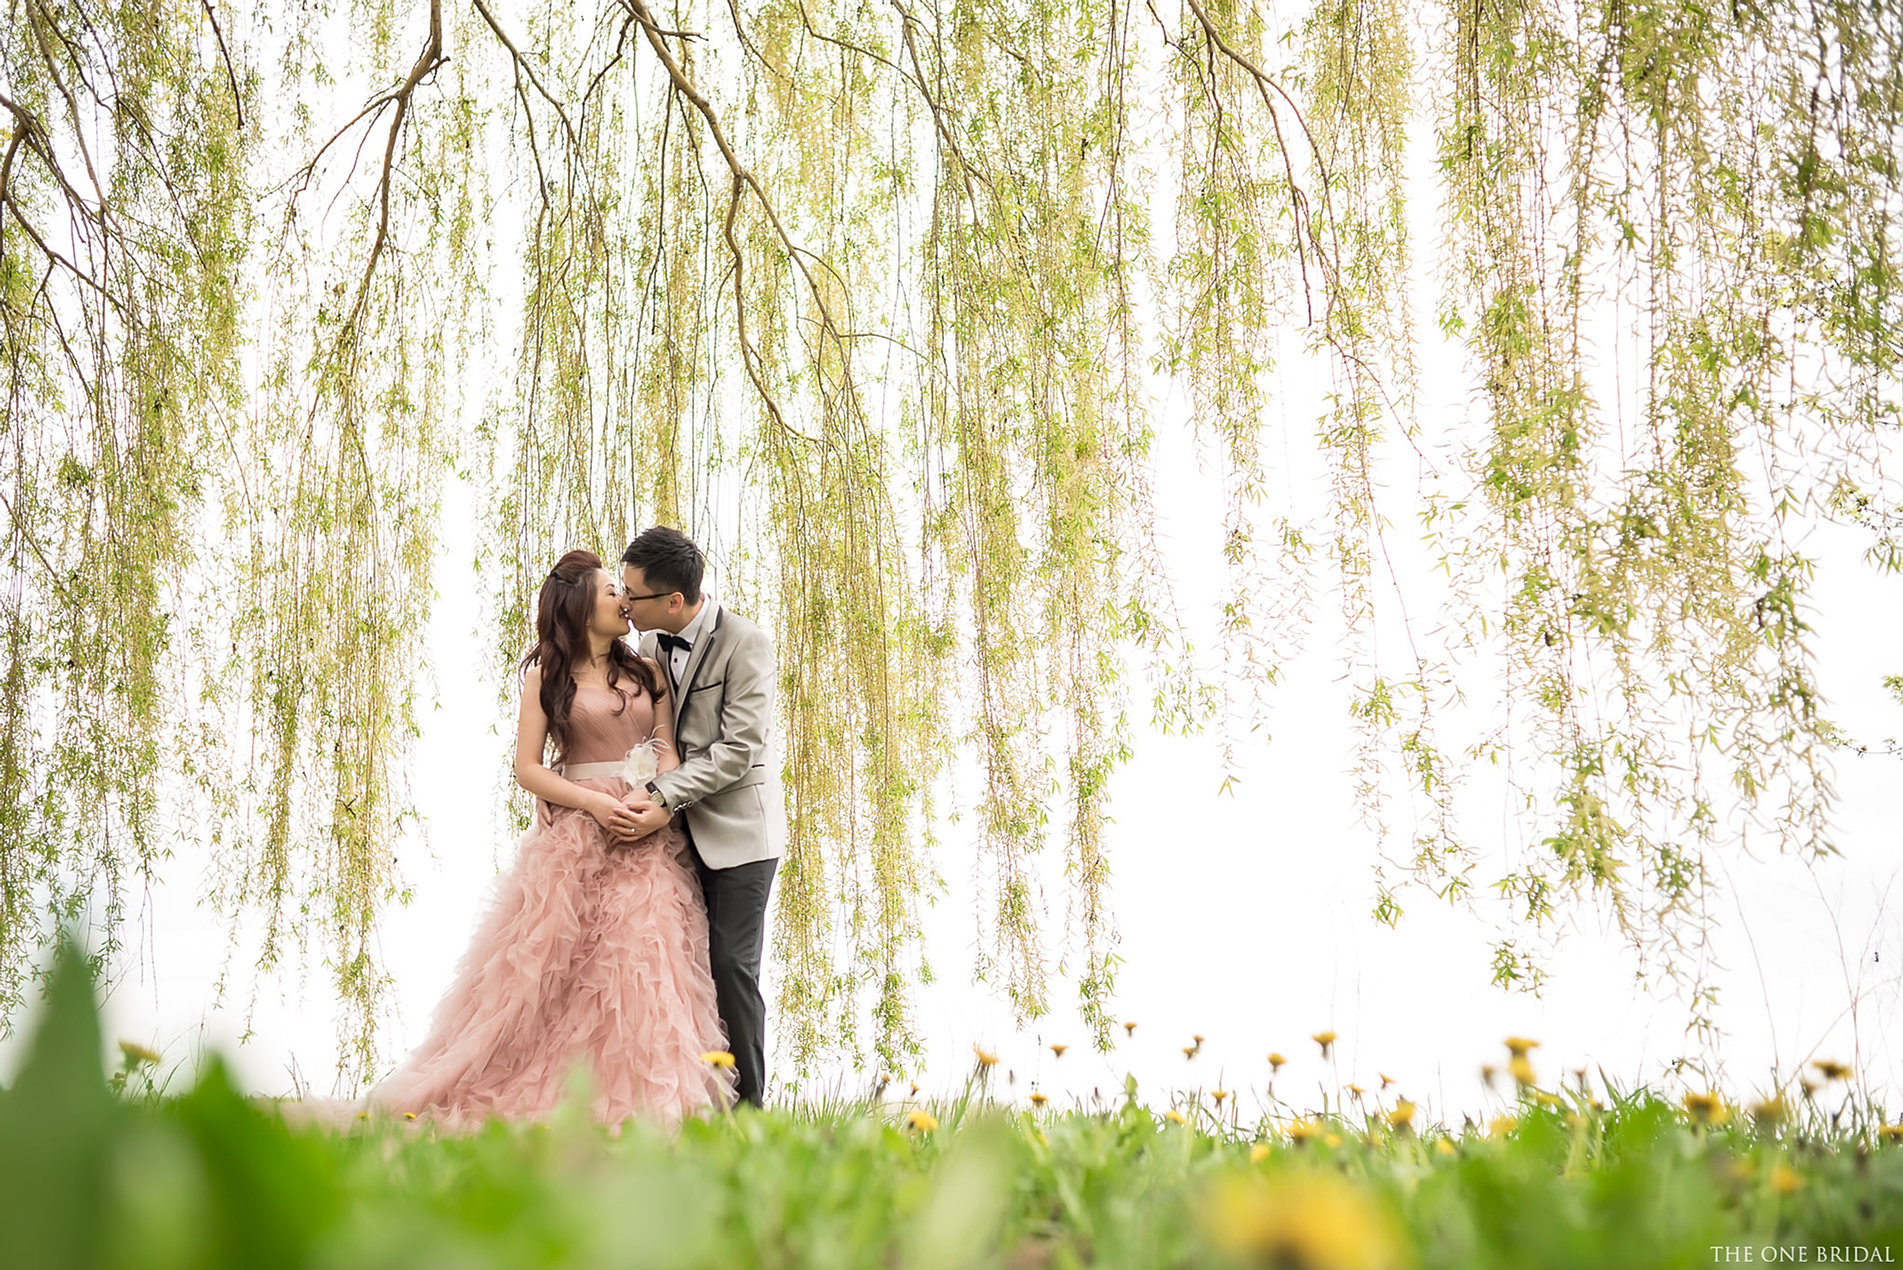 Beach Wedding Dresses Toronto : Toronto bridal wedding dress and photographer the